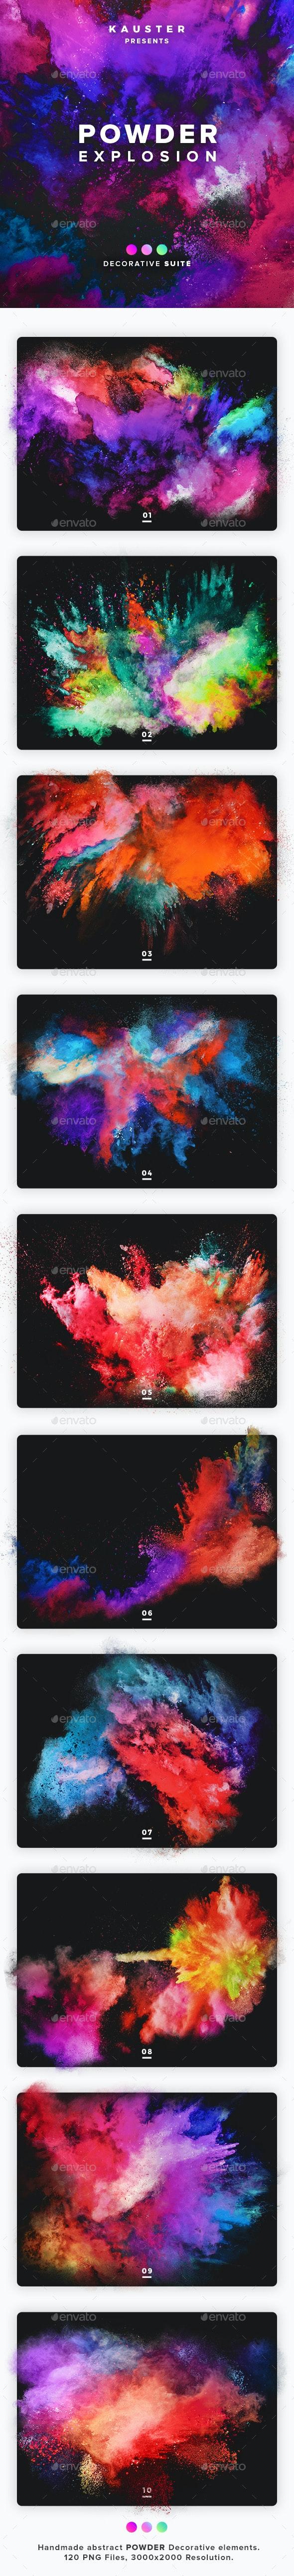 Powder Explosion Decorative Suite - Decorative Graphics